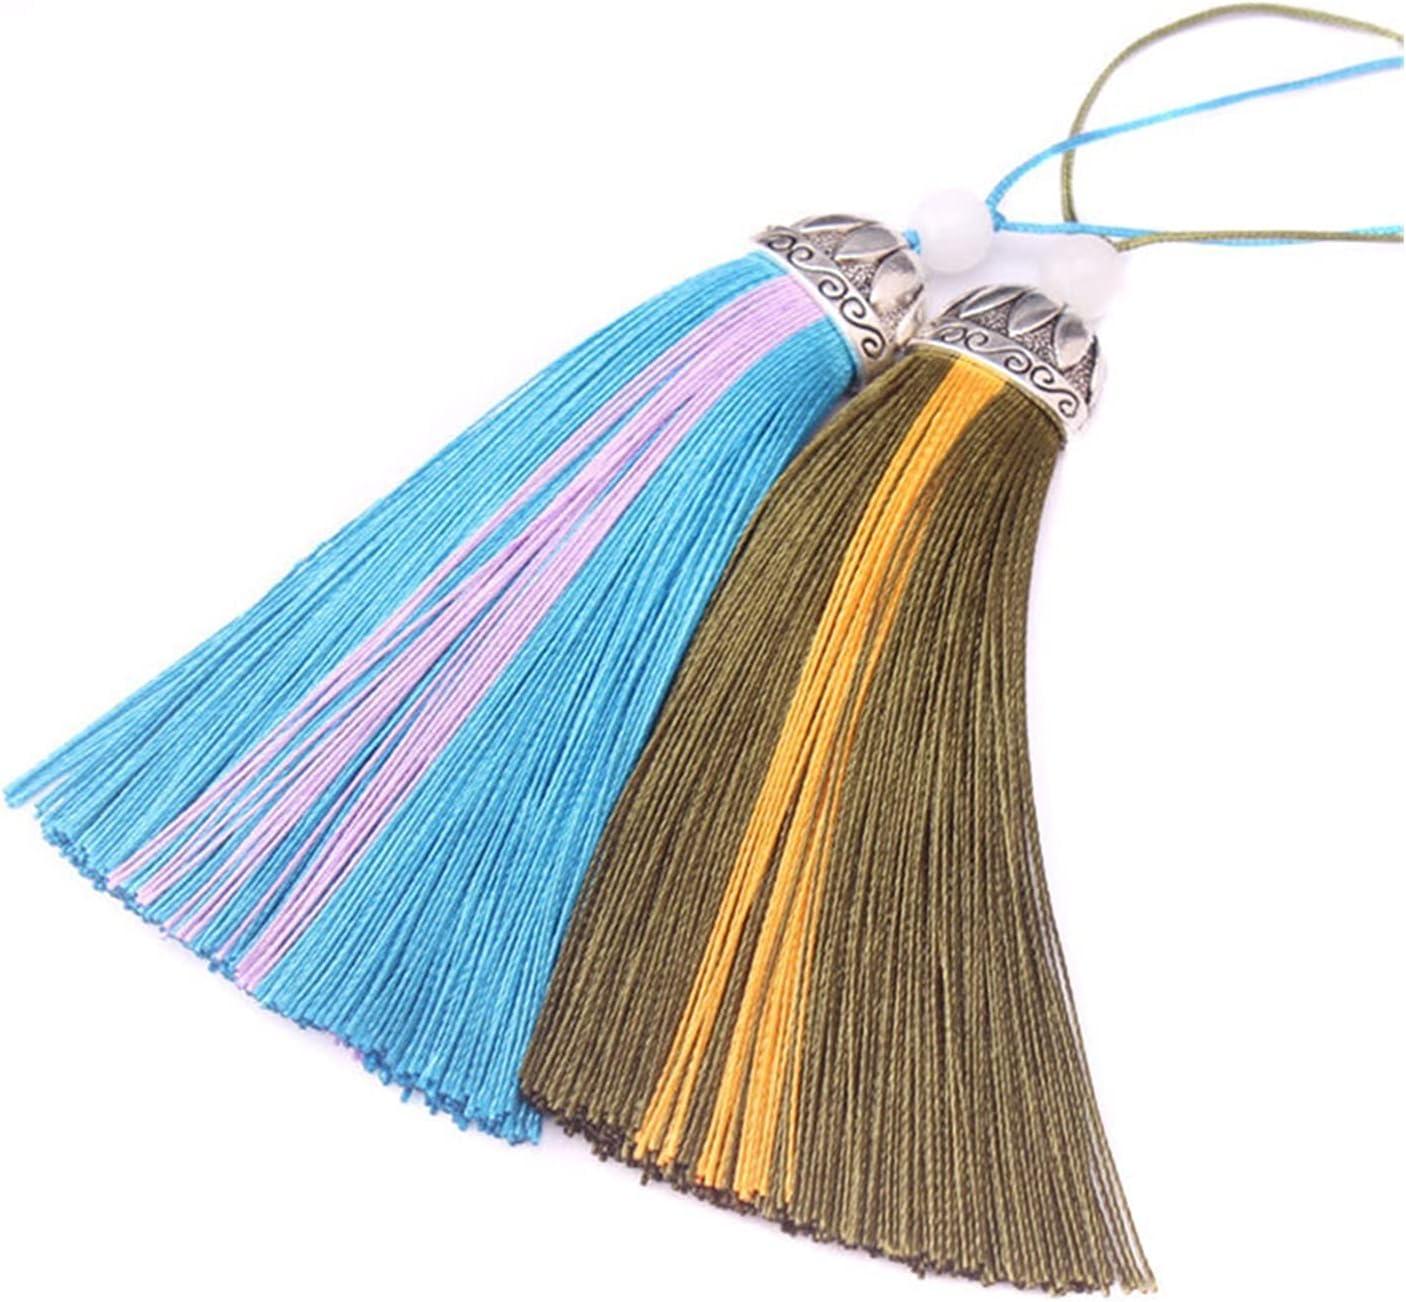 Large special price Ranking TOP8 QWXZ Tassel 10cm Tassels Decorative Silk DIY garniture Ta Fringe